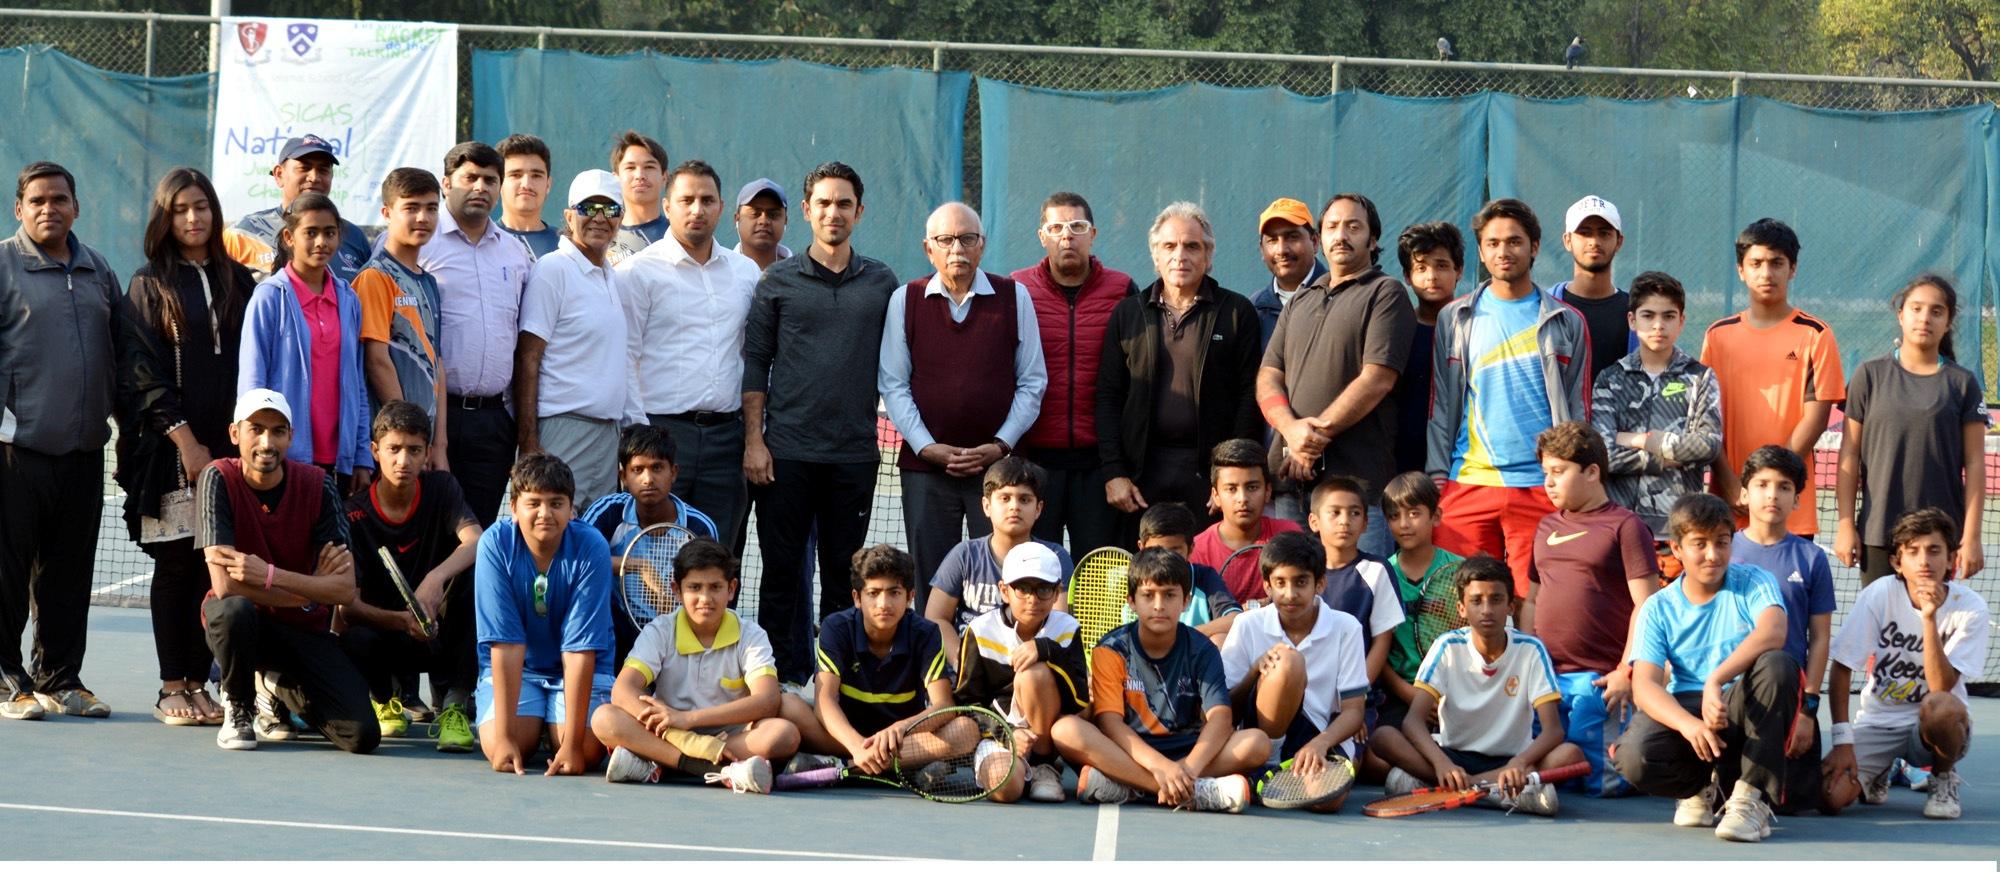 6th SICAS National Junior Tennis Championship's participants